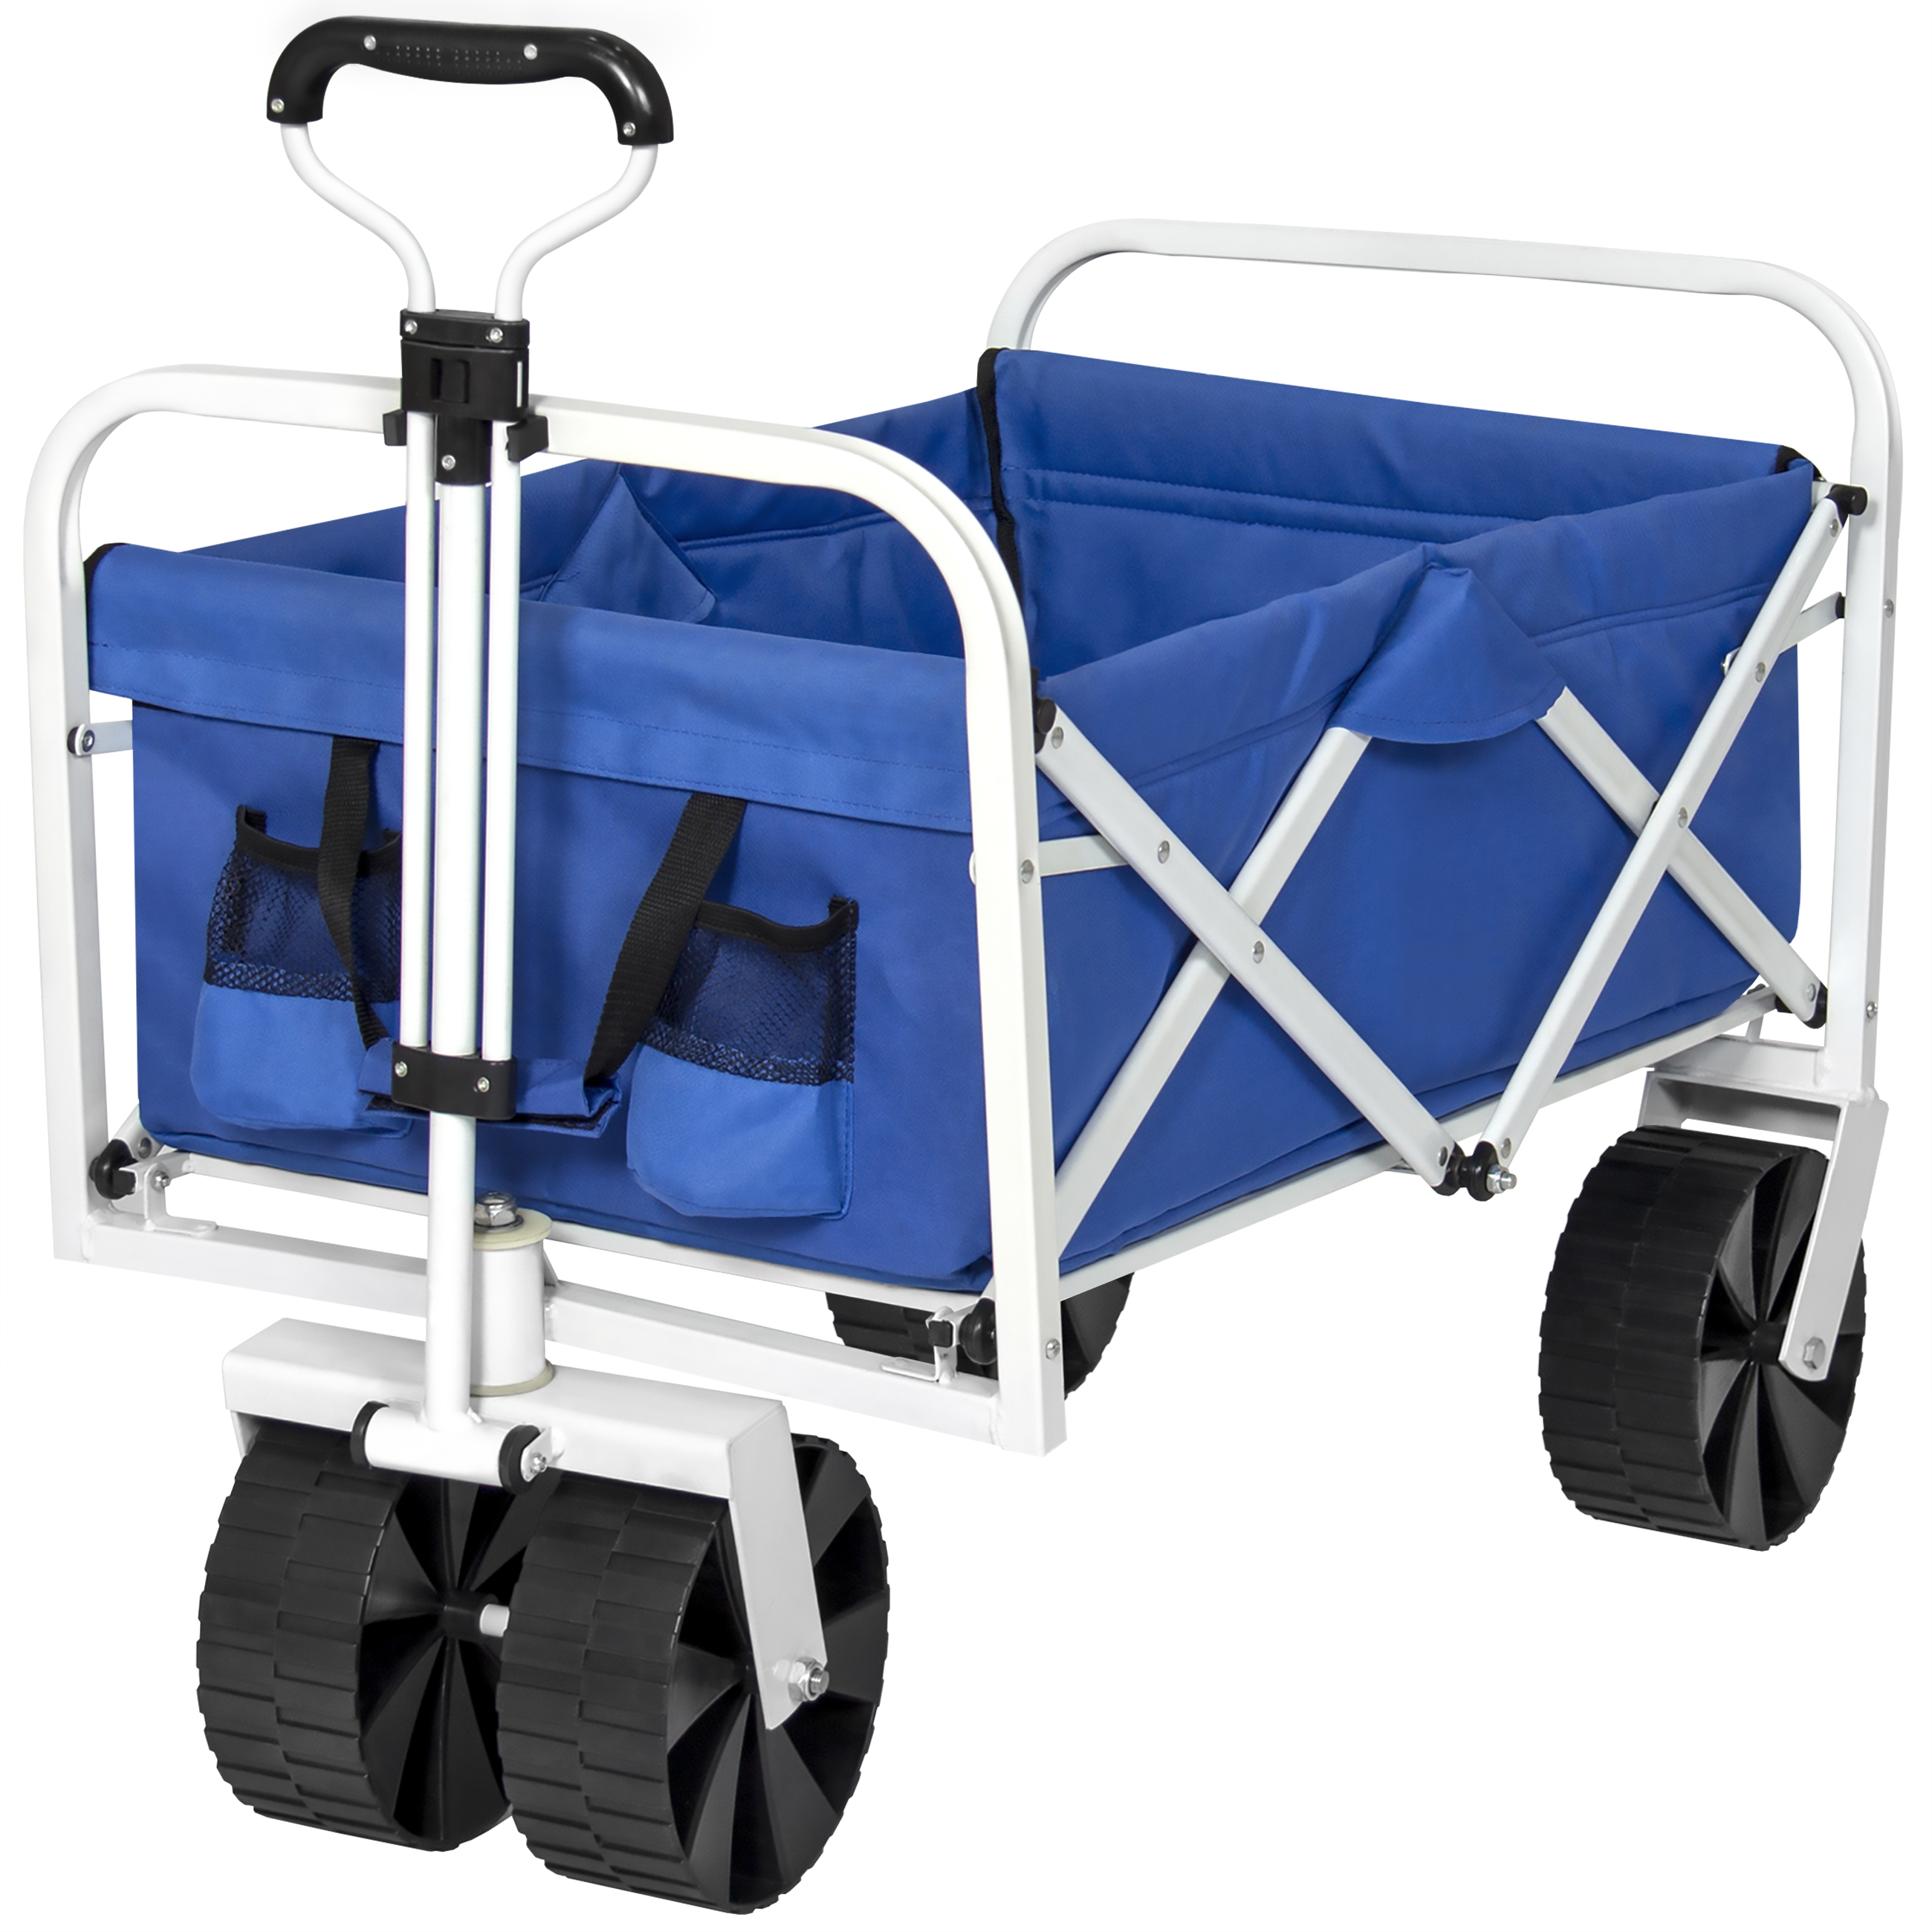 Best Choice Products Folding Utility Wagon Garden Beach Cart W/ All-Terrain Wheels- Blue